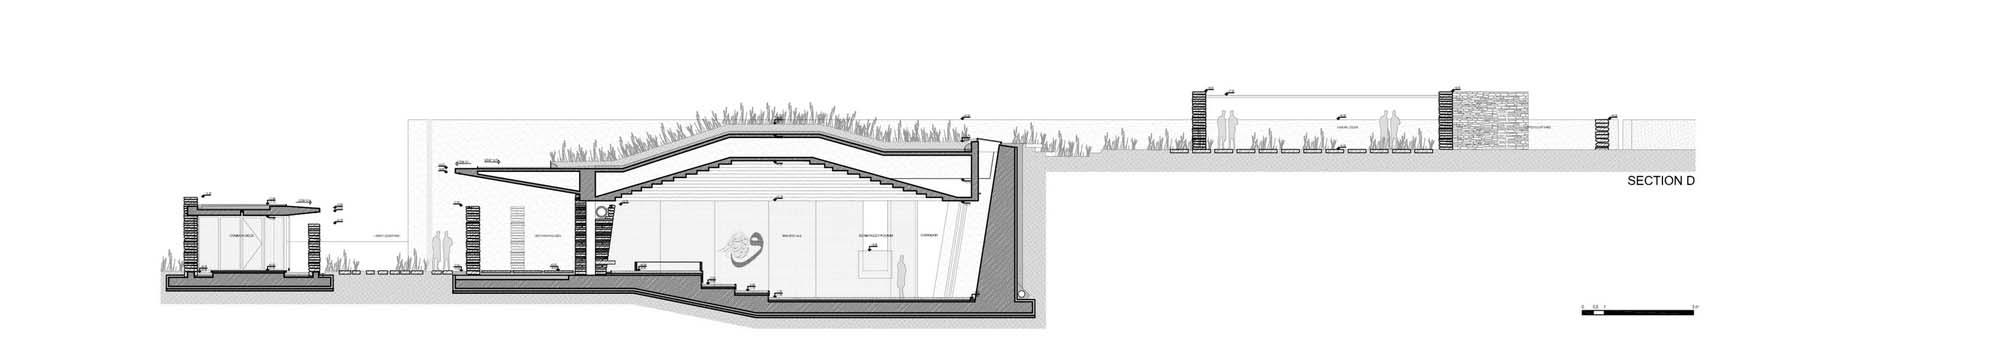 17-Emre-Arolat-Architects-Sancaklar-Mosque